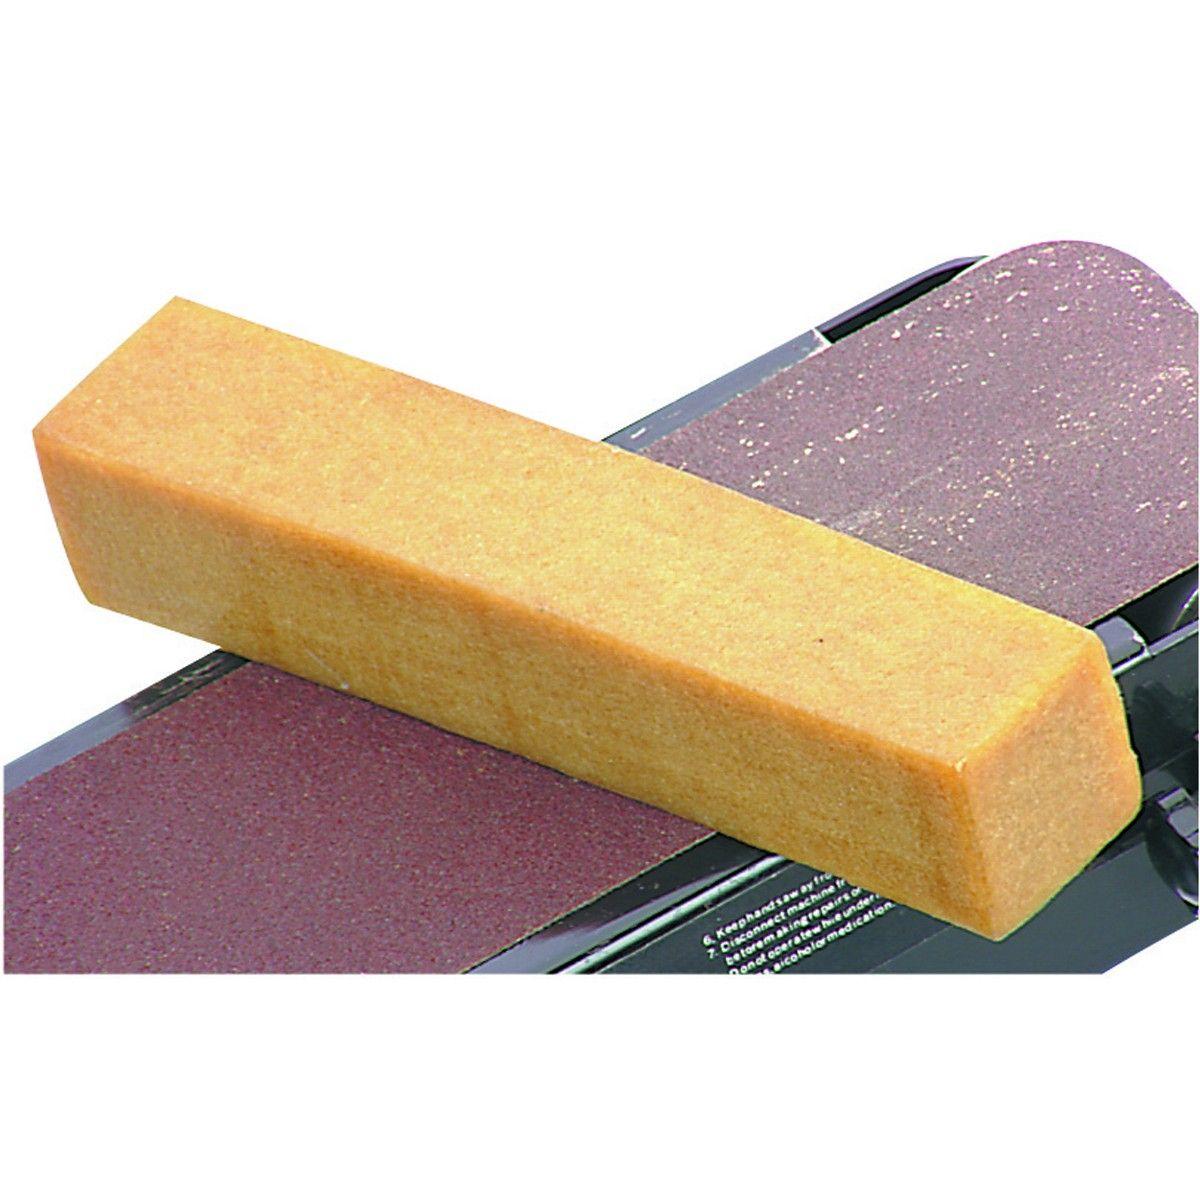 Sanding Belt Cleaner Cleaning Belt Stripping Paint